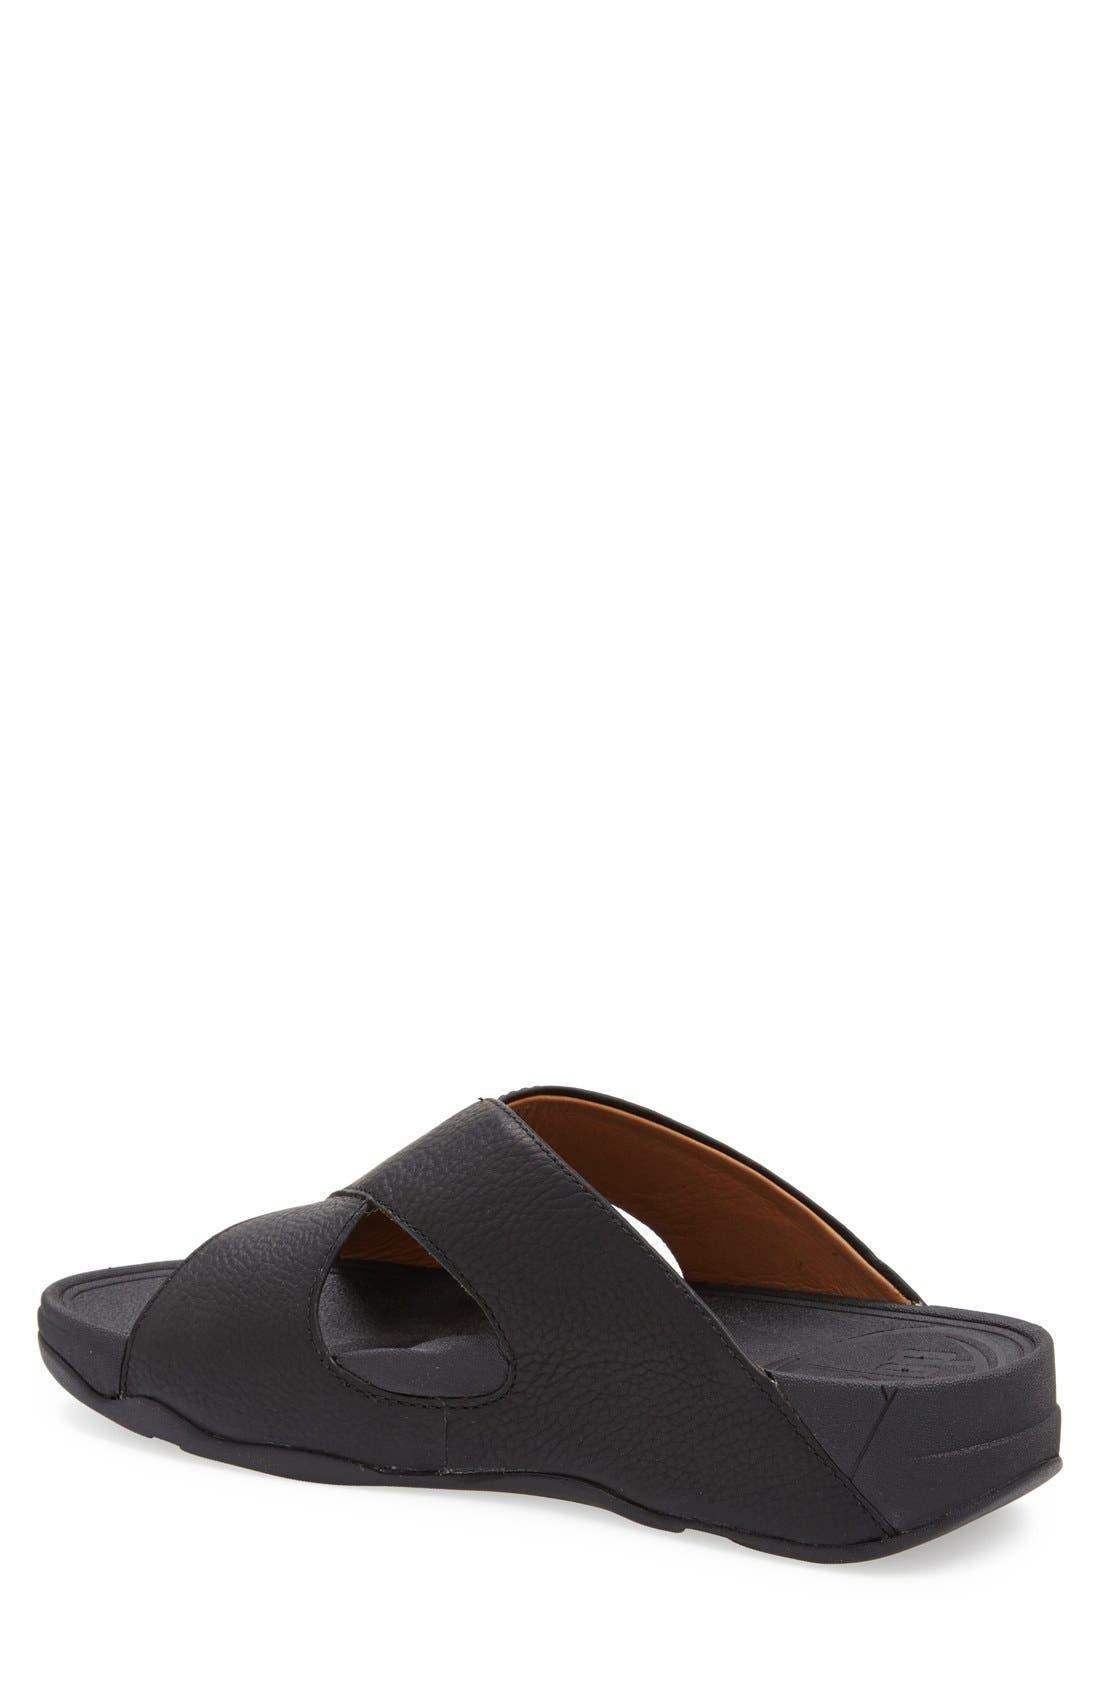 Xosa<sup>™</sup> Leather Slide Sandal,                             Alternate thumbnail 3, color,                             001